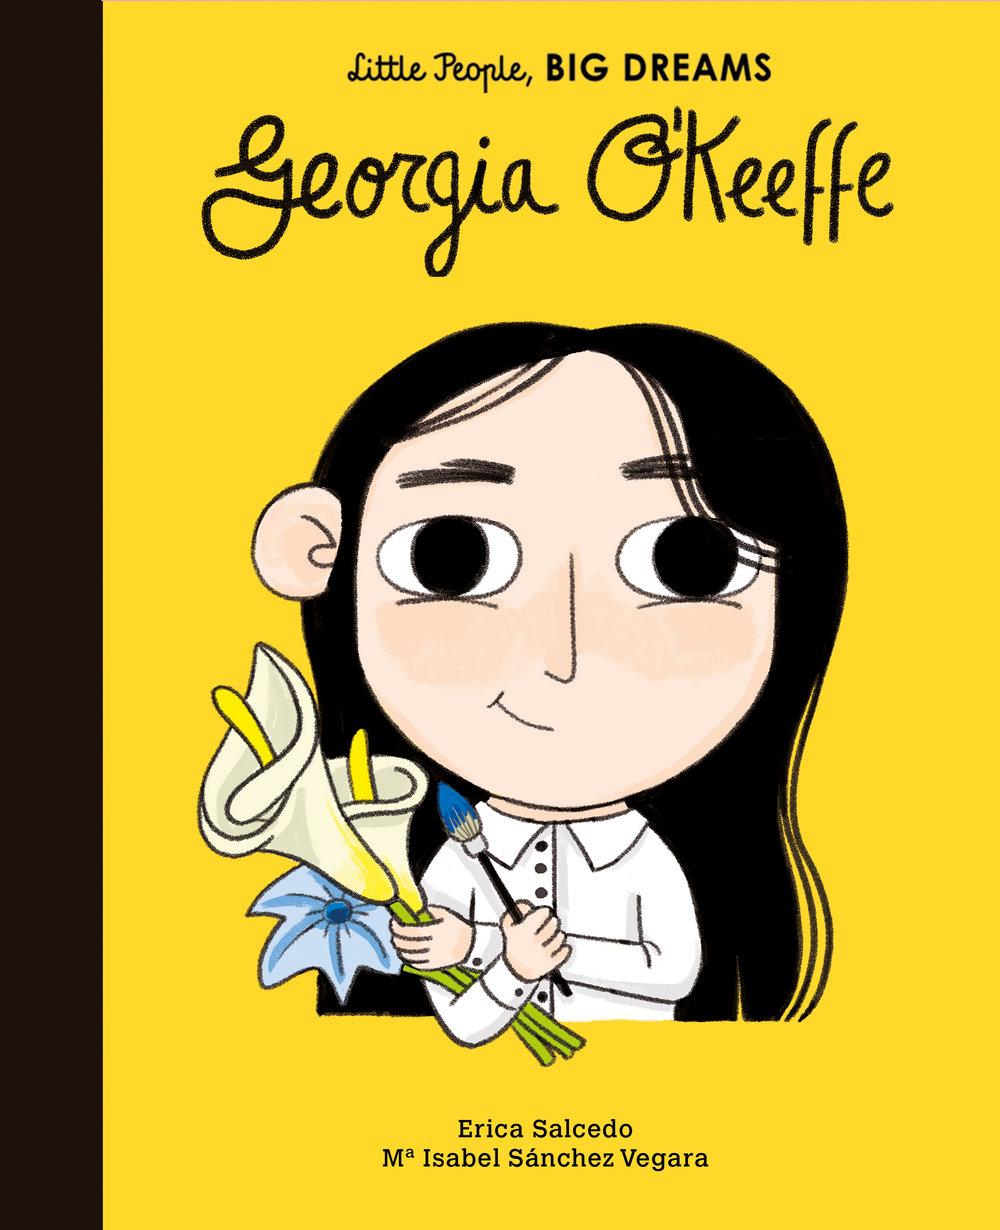 georgia-okeeffe-little-people-big-dreams.jpeg